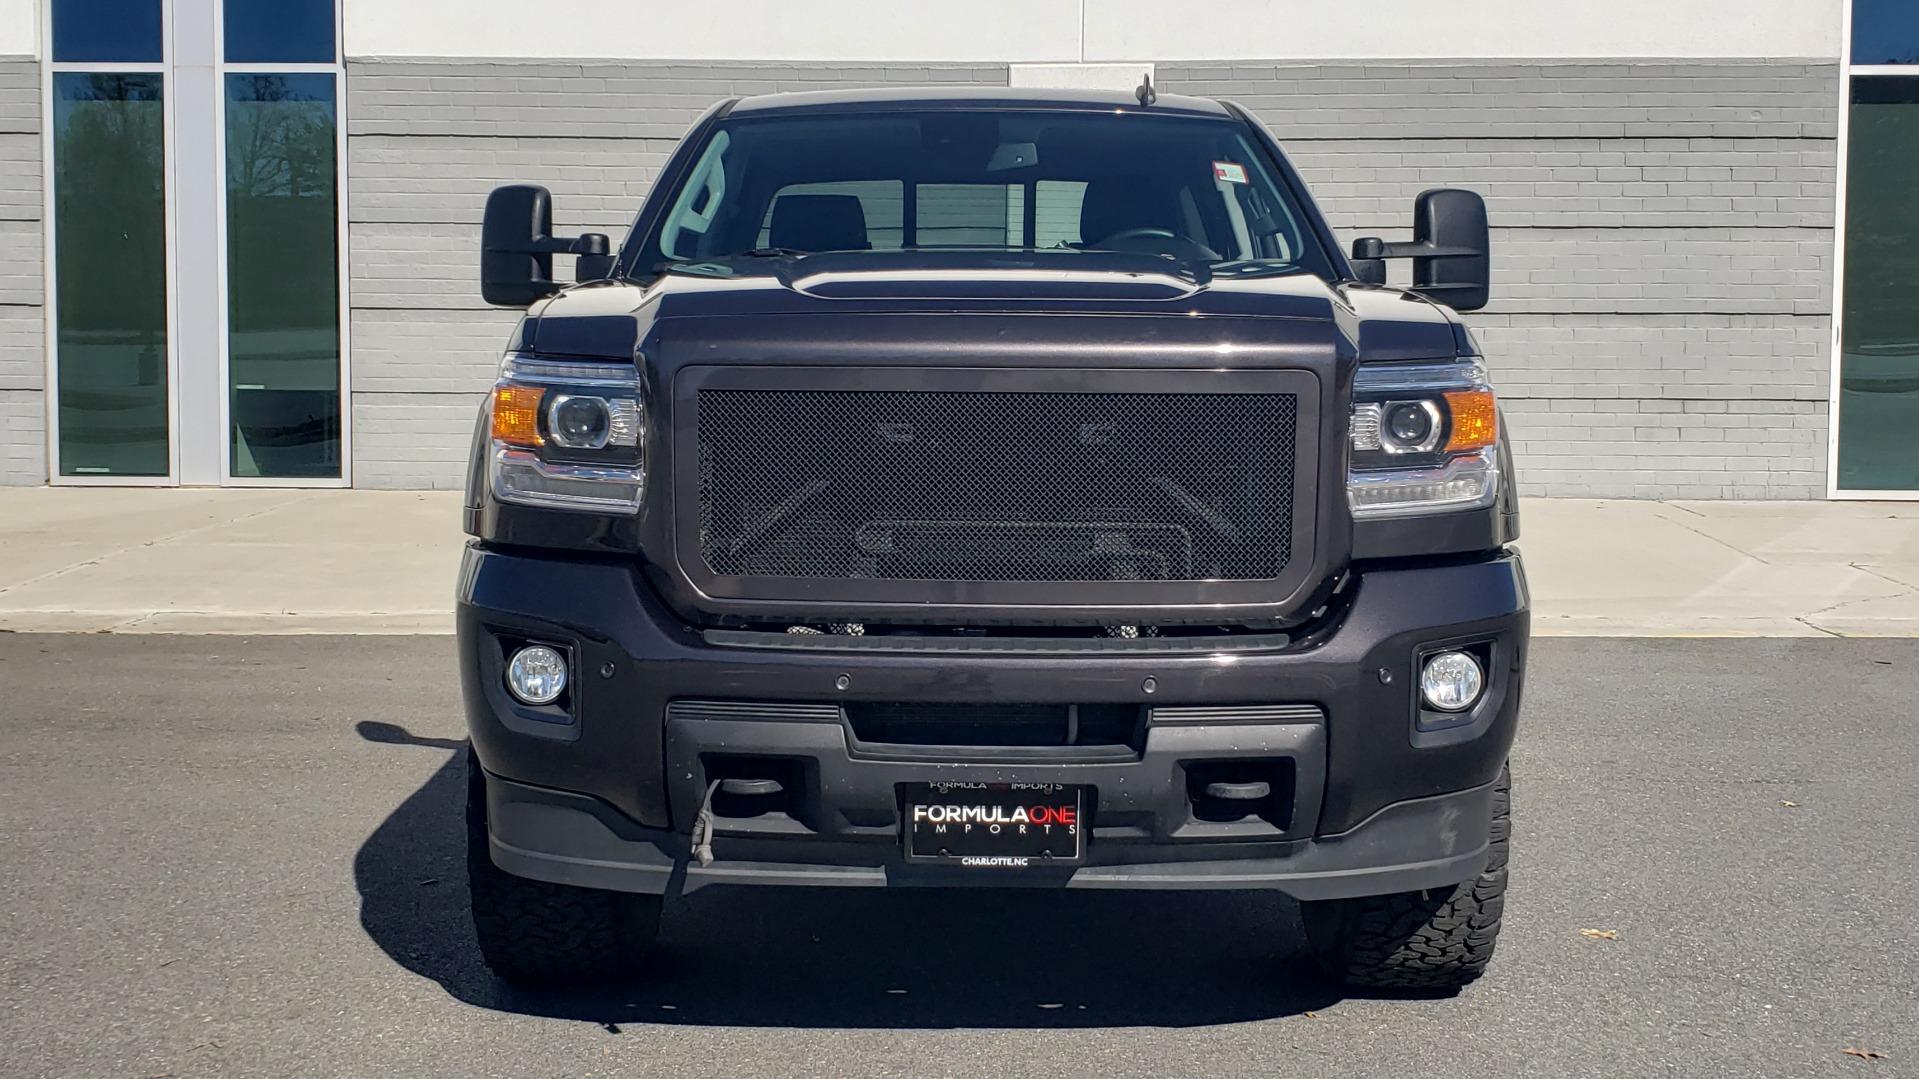 Used 2015 GMC SIERRA 2500HD DENALI 4WD CREWCAB / 6.6L DURAMAX / 6-SPD AUTO / NAV / BOSE for sale $50,995 at Formula Imports in Charlotte NC 28227 22